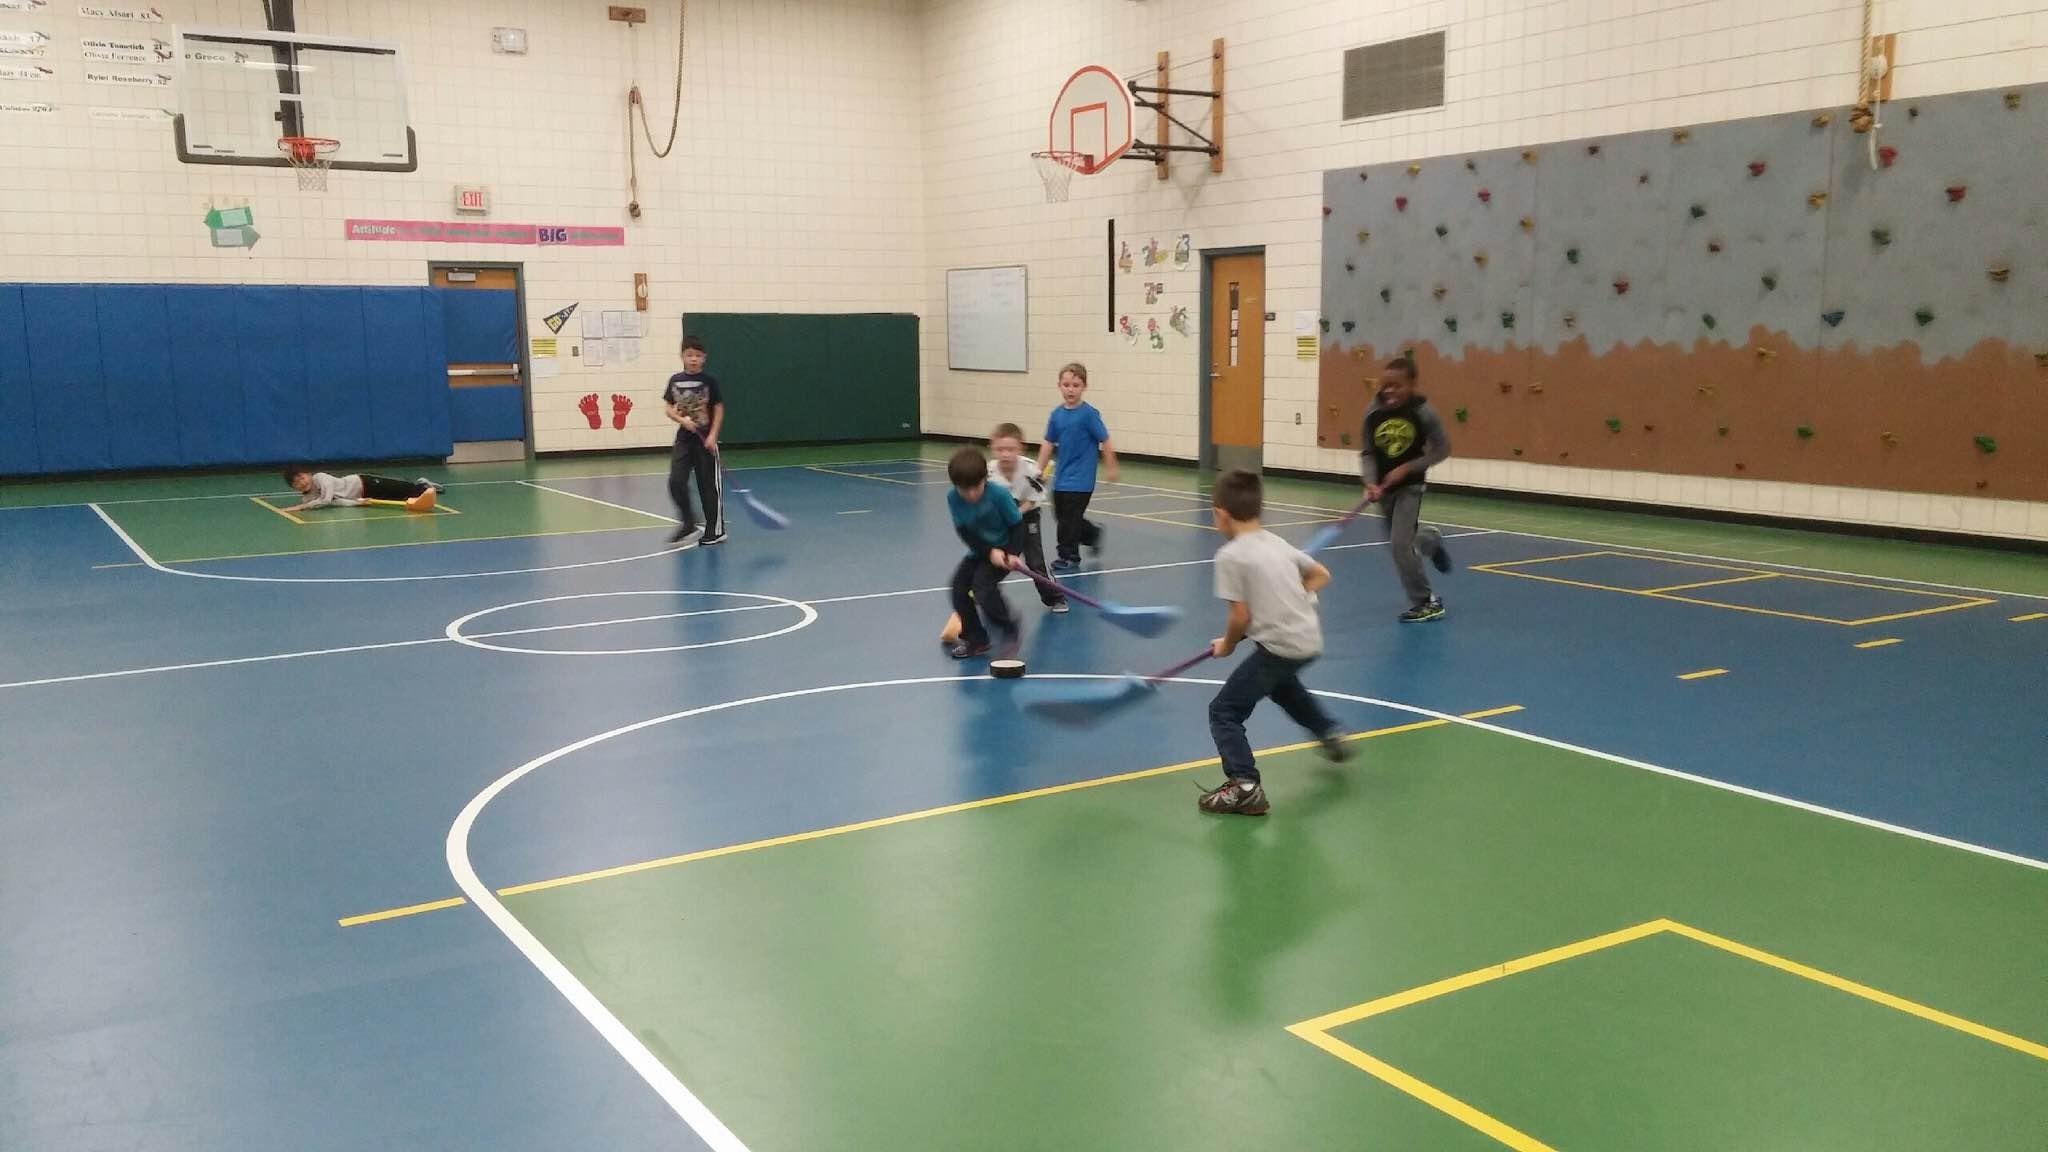 Boys playing floor hockey.